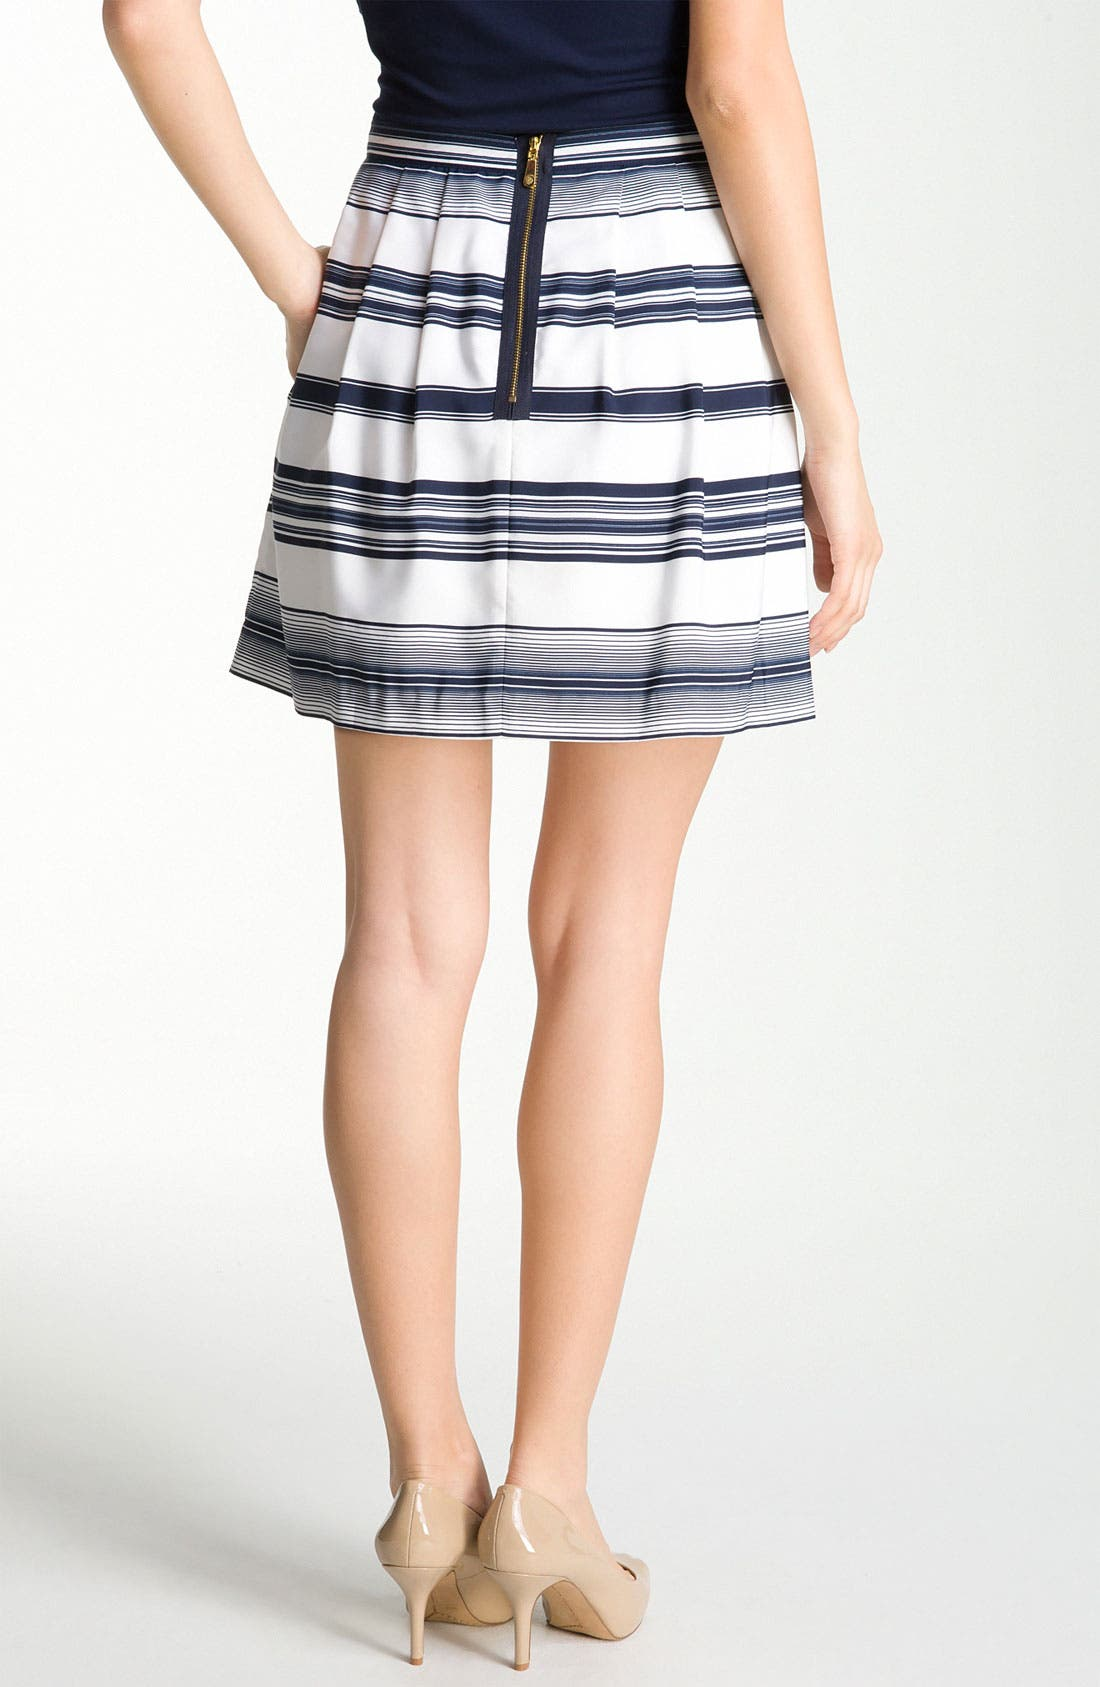 Alternate Image 2  - Vince Camuto 'Caribbean Stripe' Skirt (Petite)